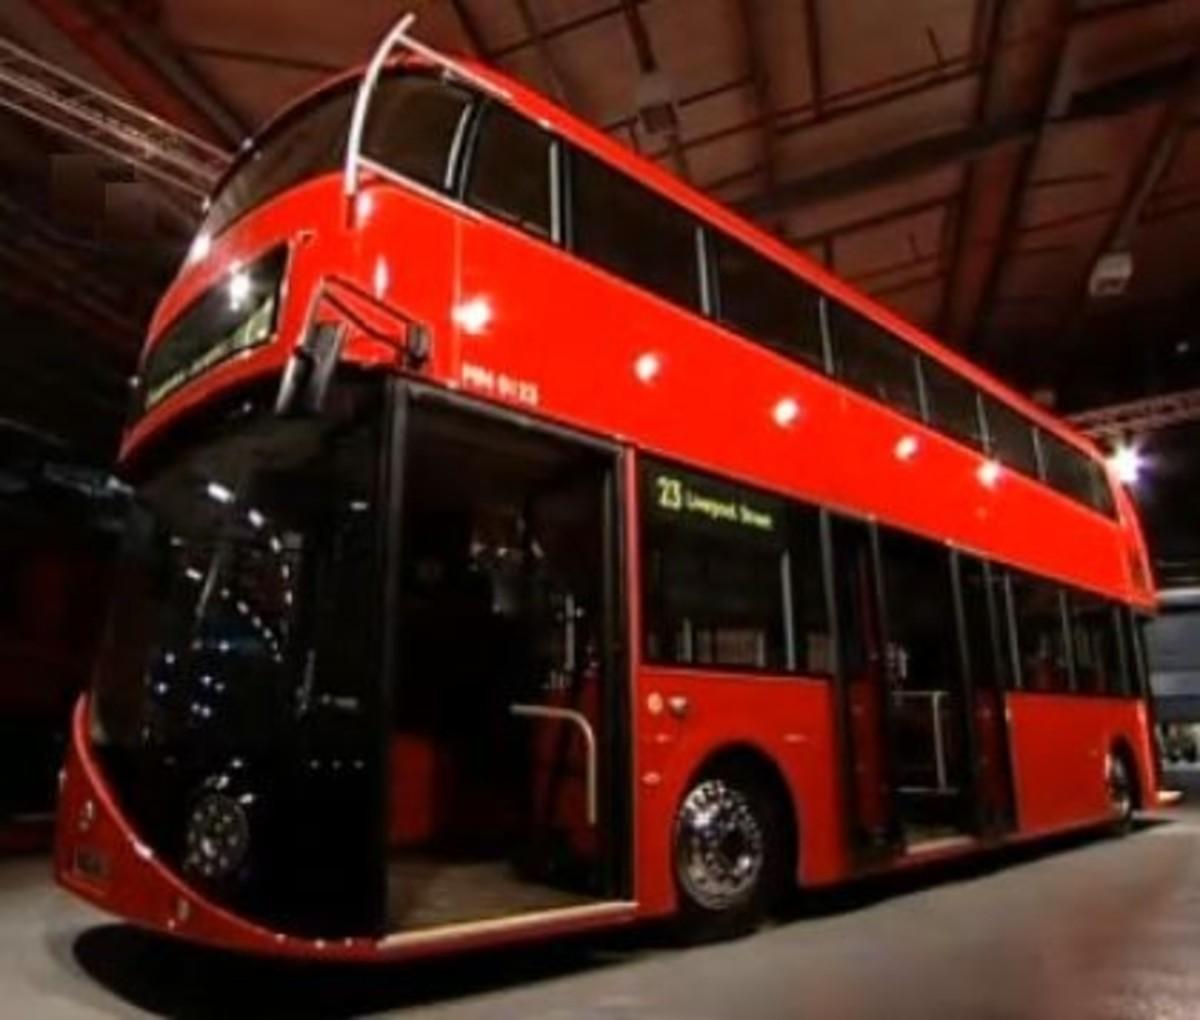 New Routemaster Bus Unveiled by Boris Johnson